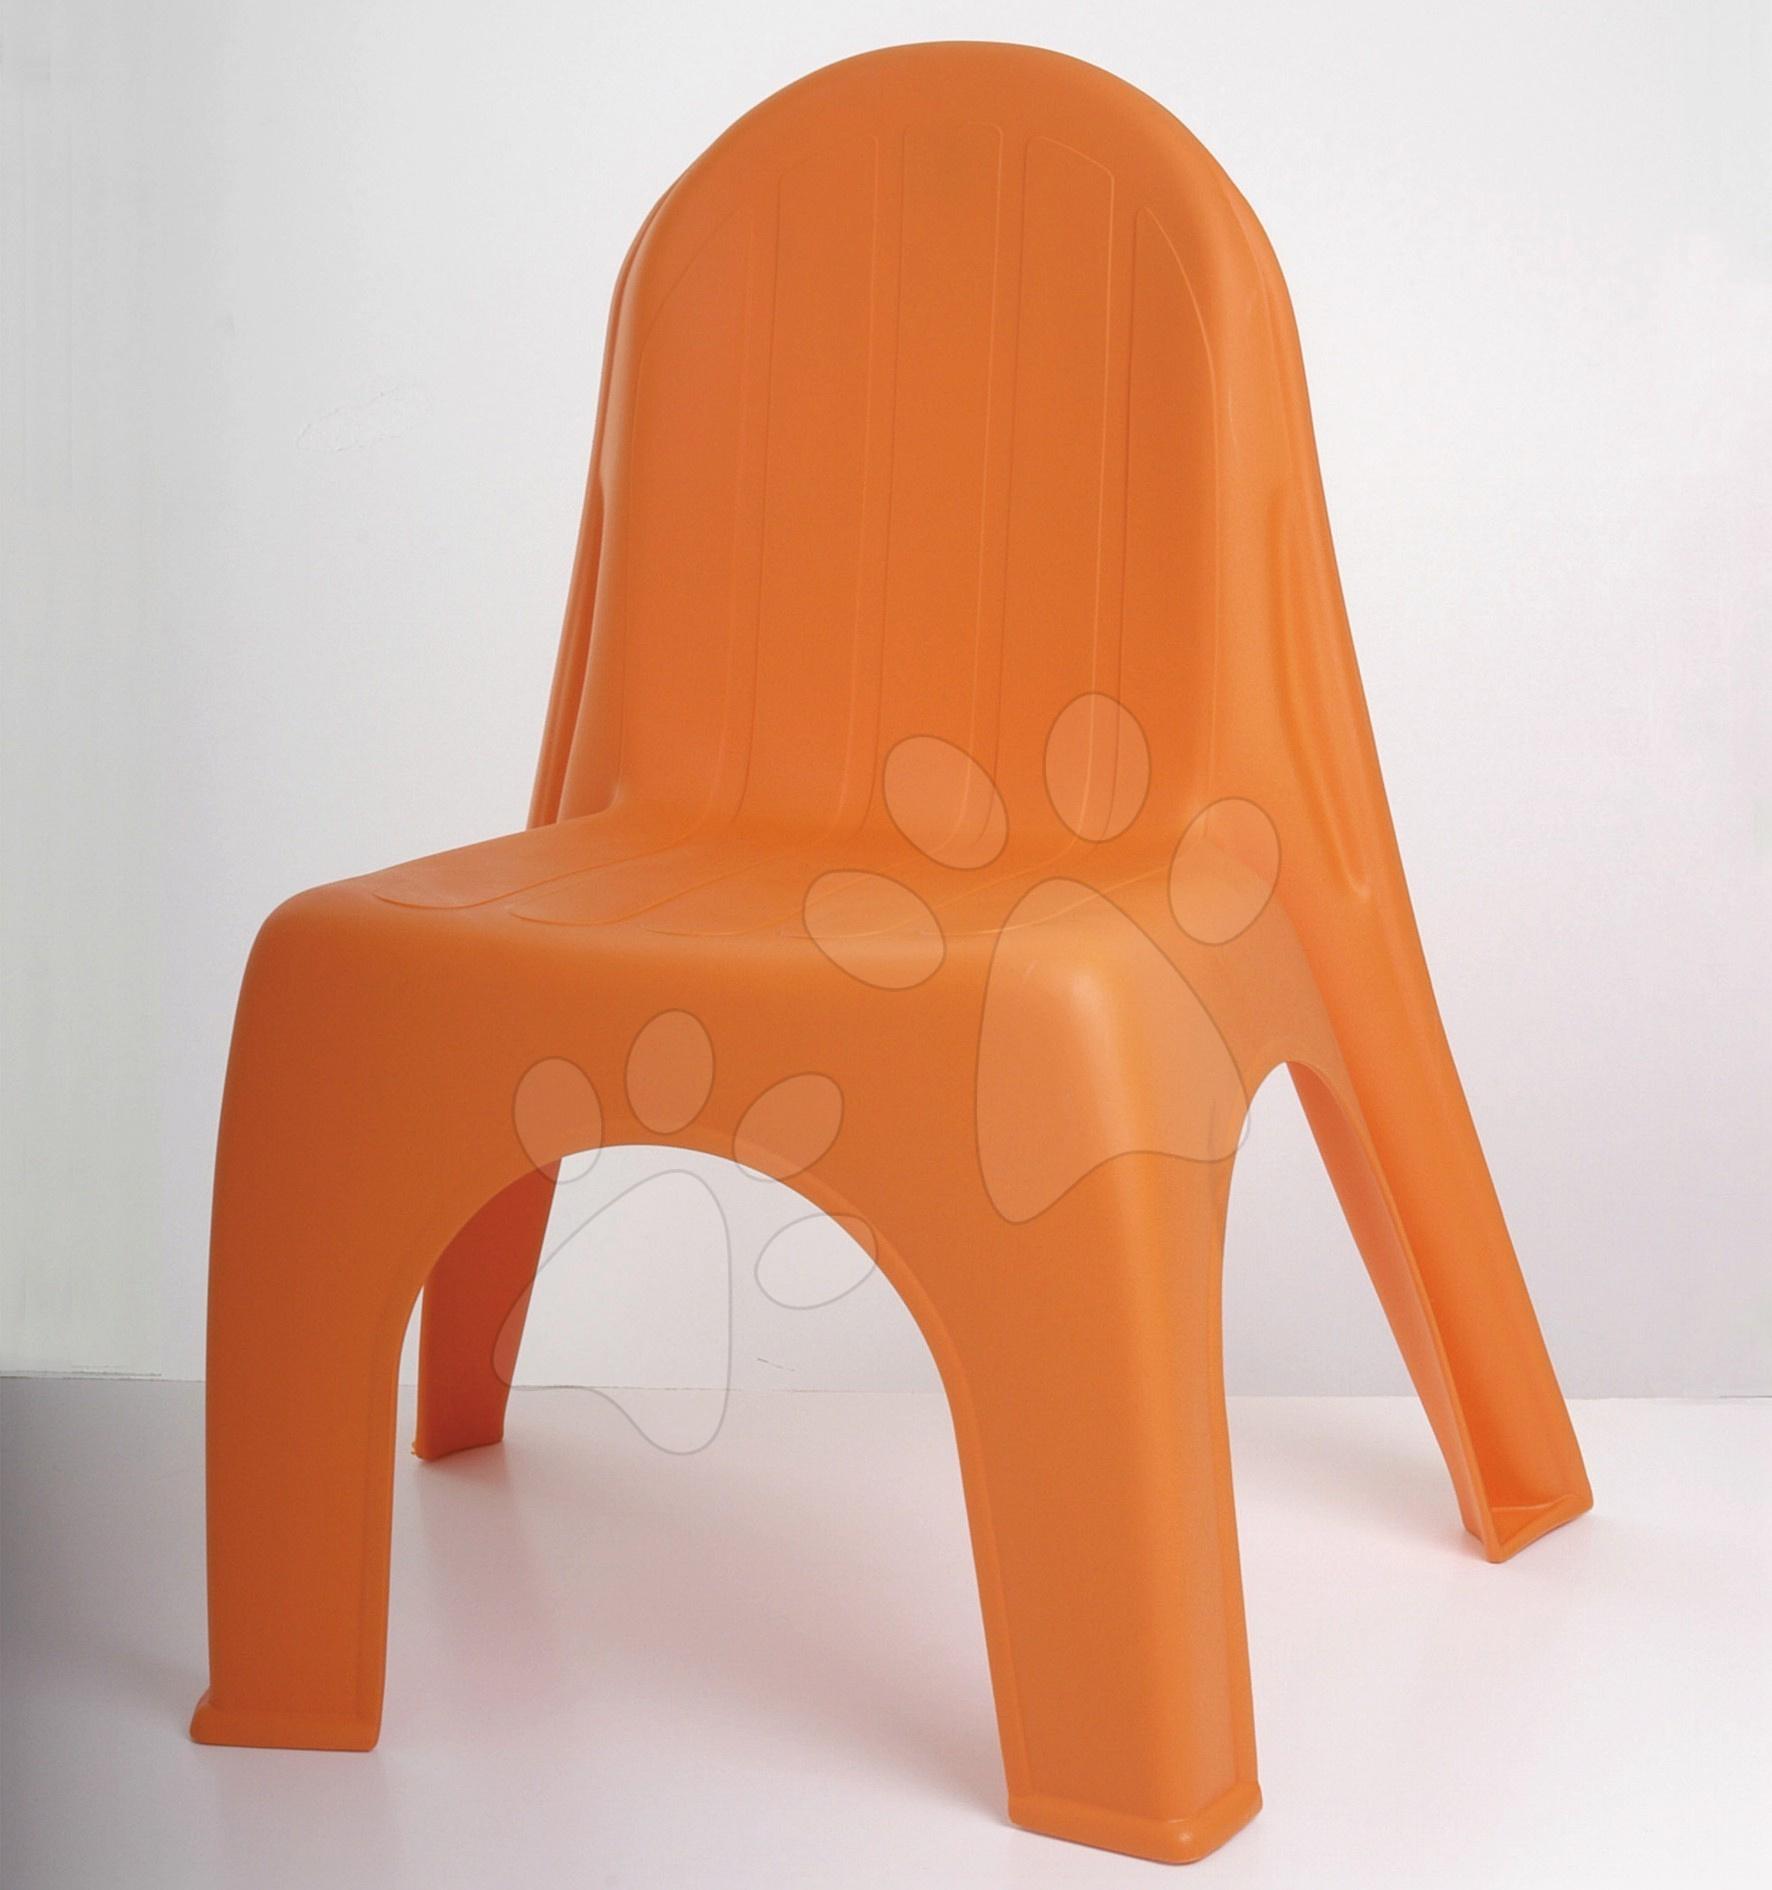 Detský záhradný nábytok - Stolička Alice Starplast matná oranžová